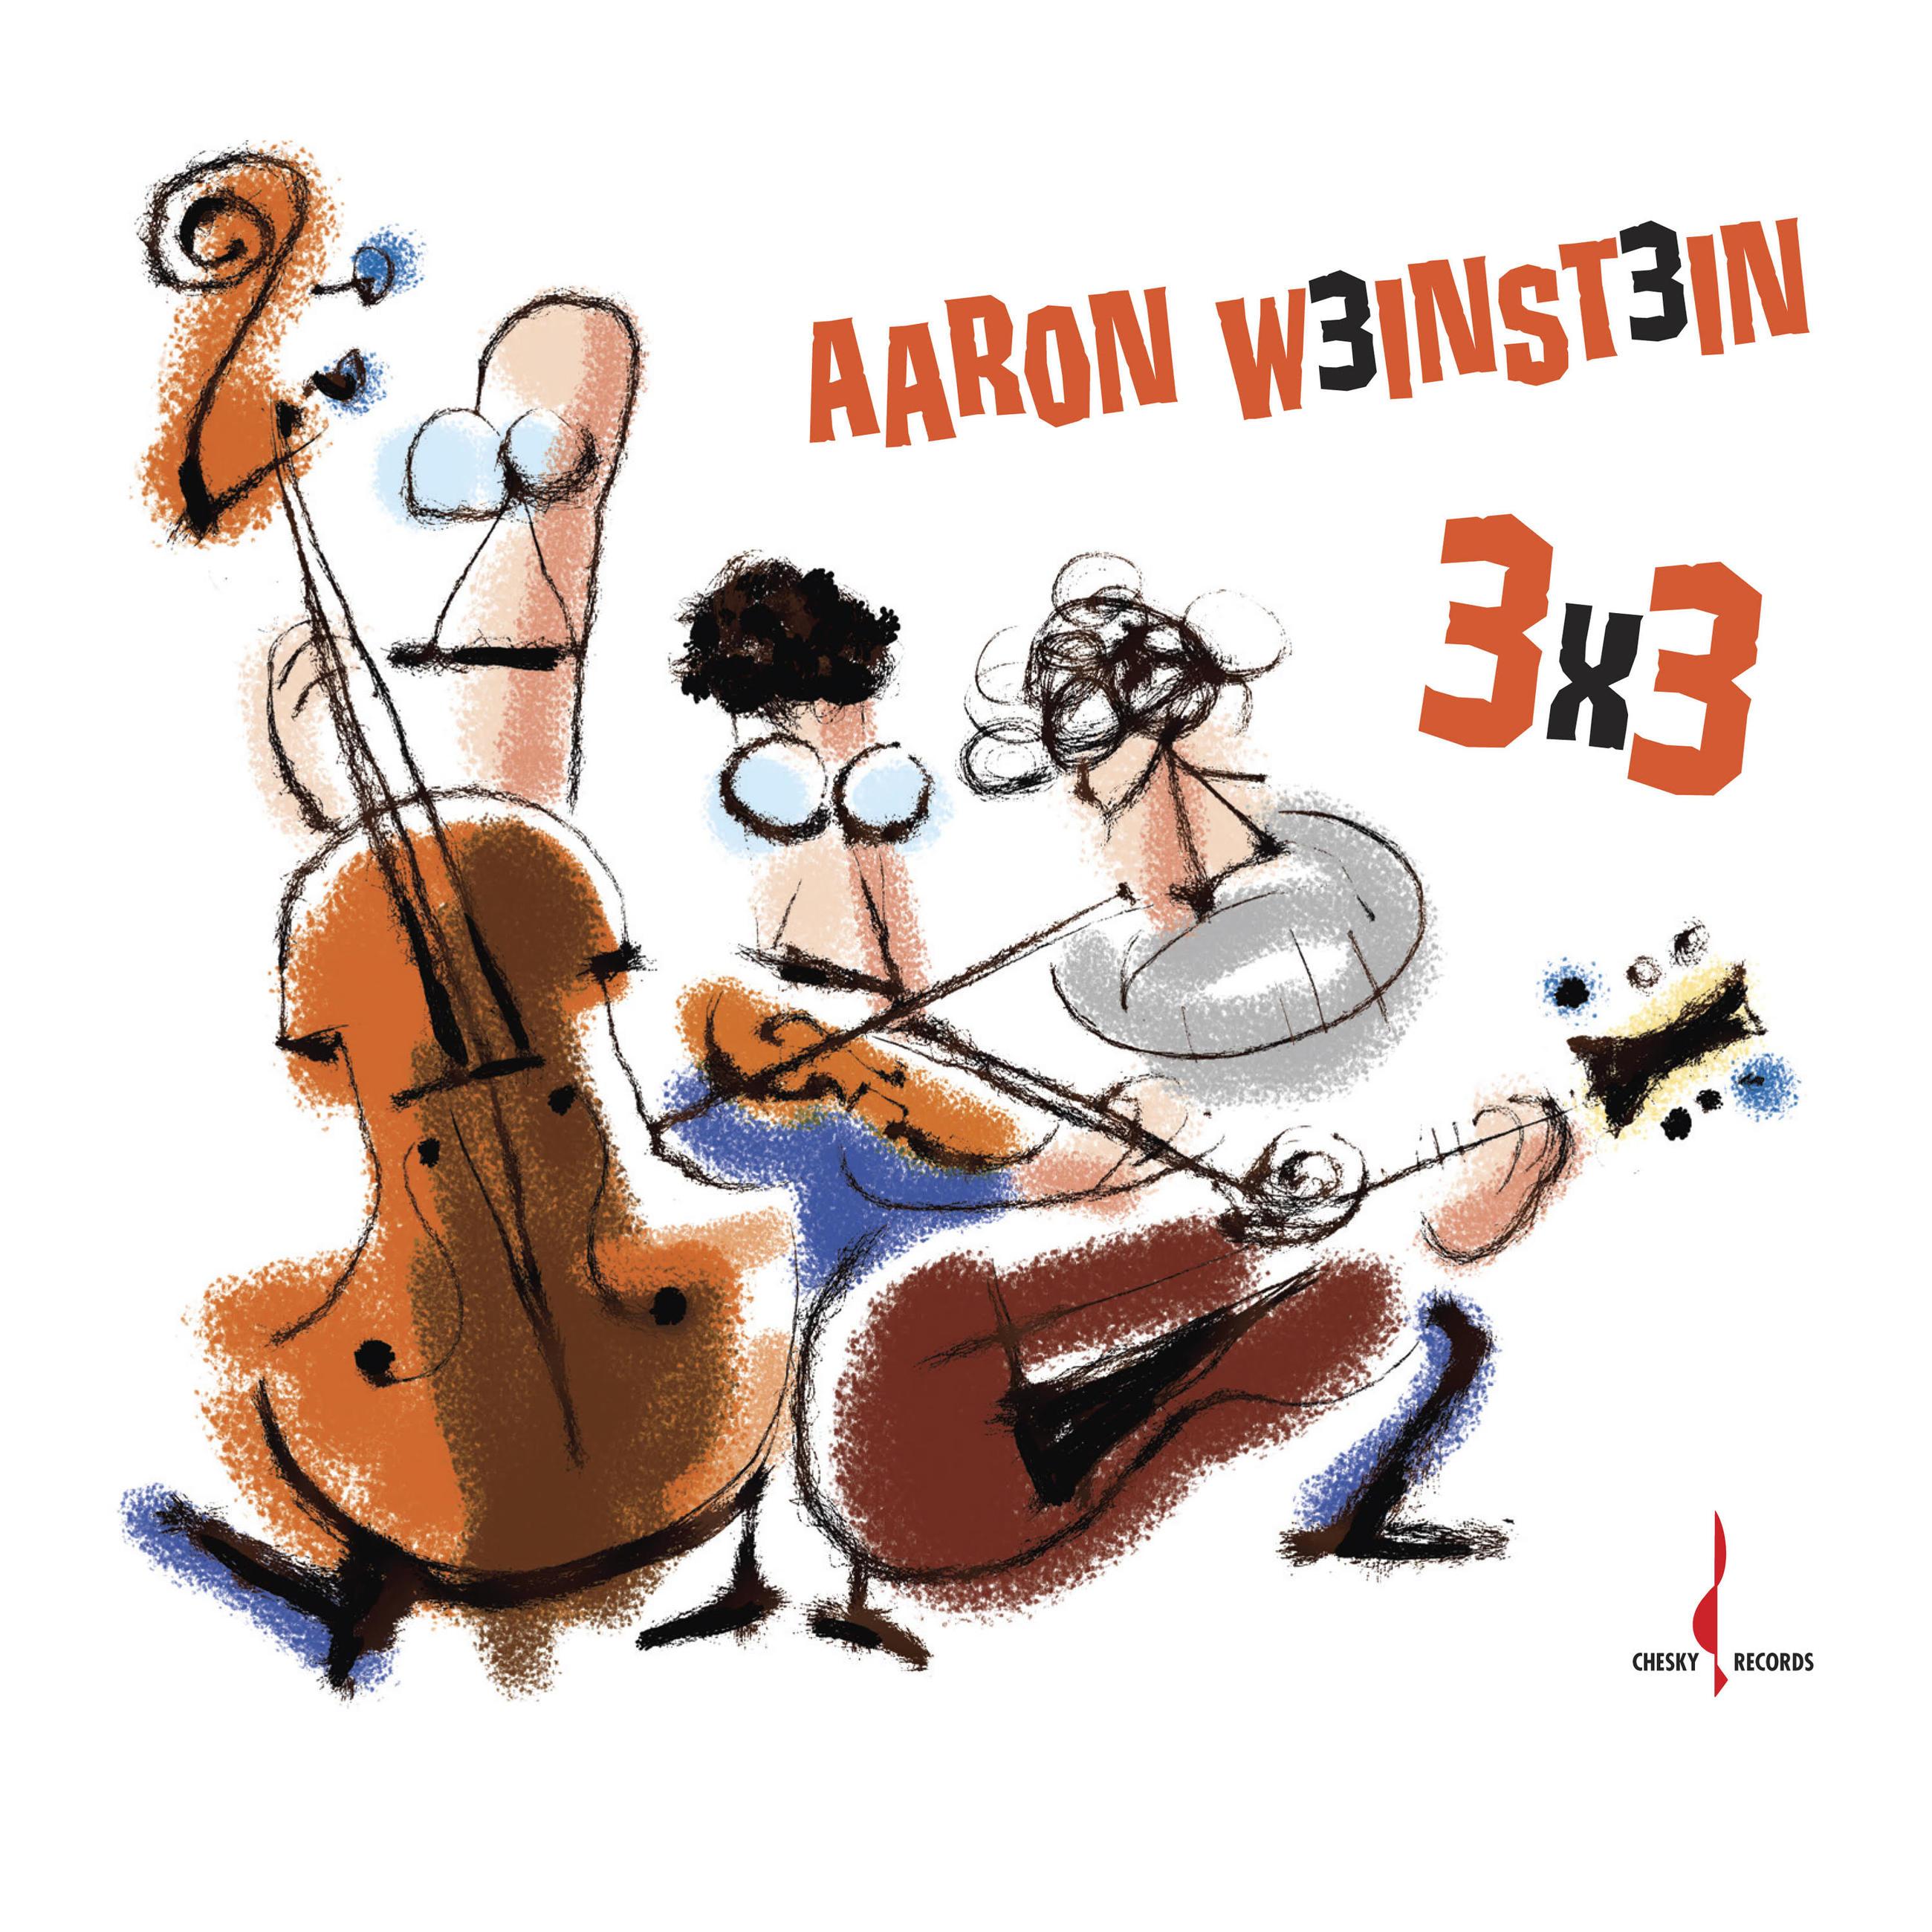 Fiddling with Mandolin on Aaron Weinstein's Chesky Jazz Debut 3x3